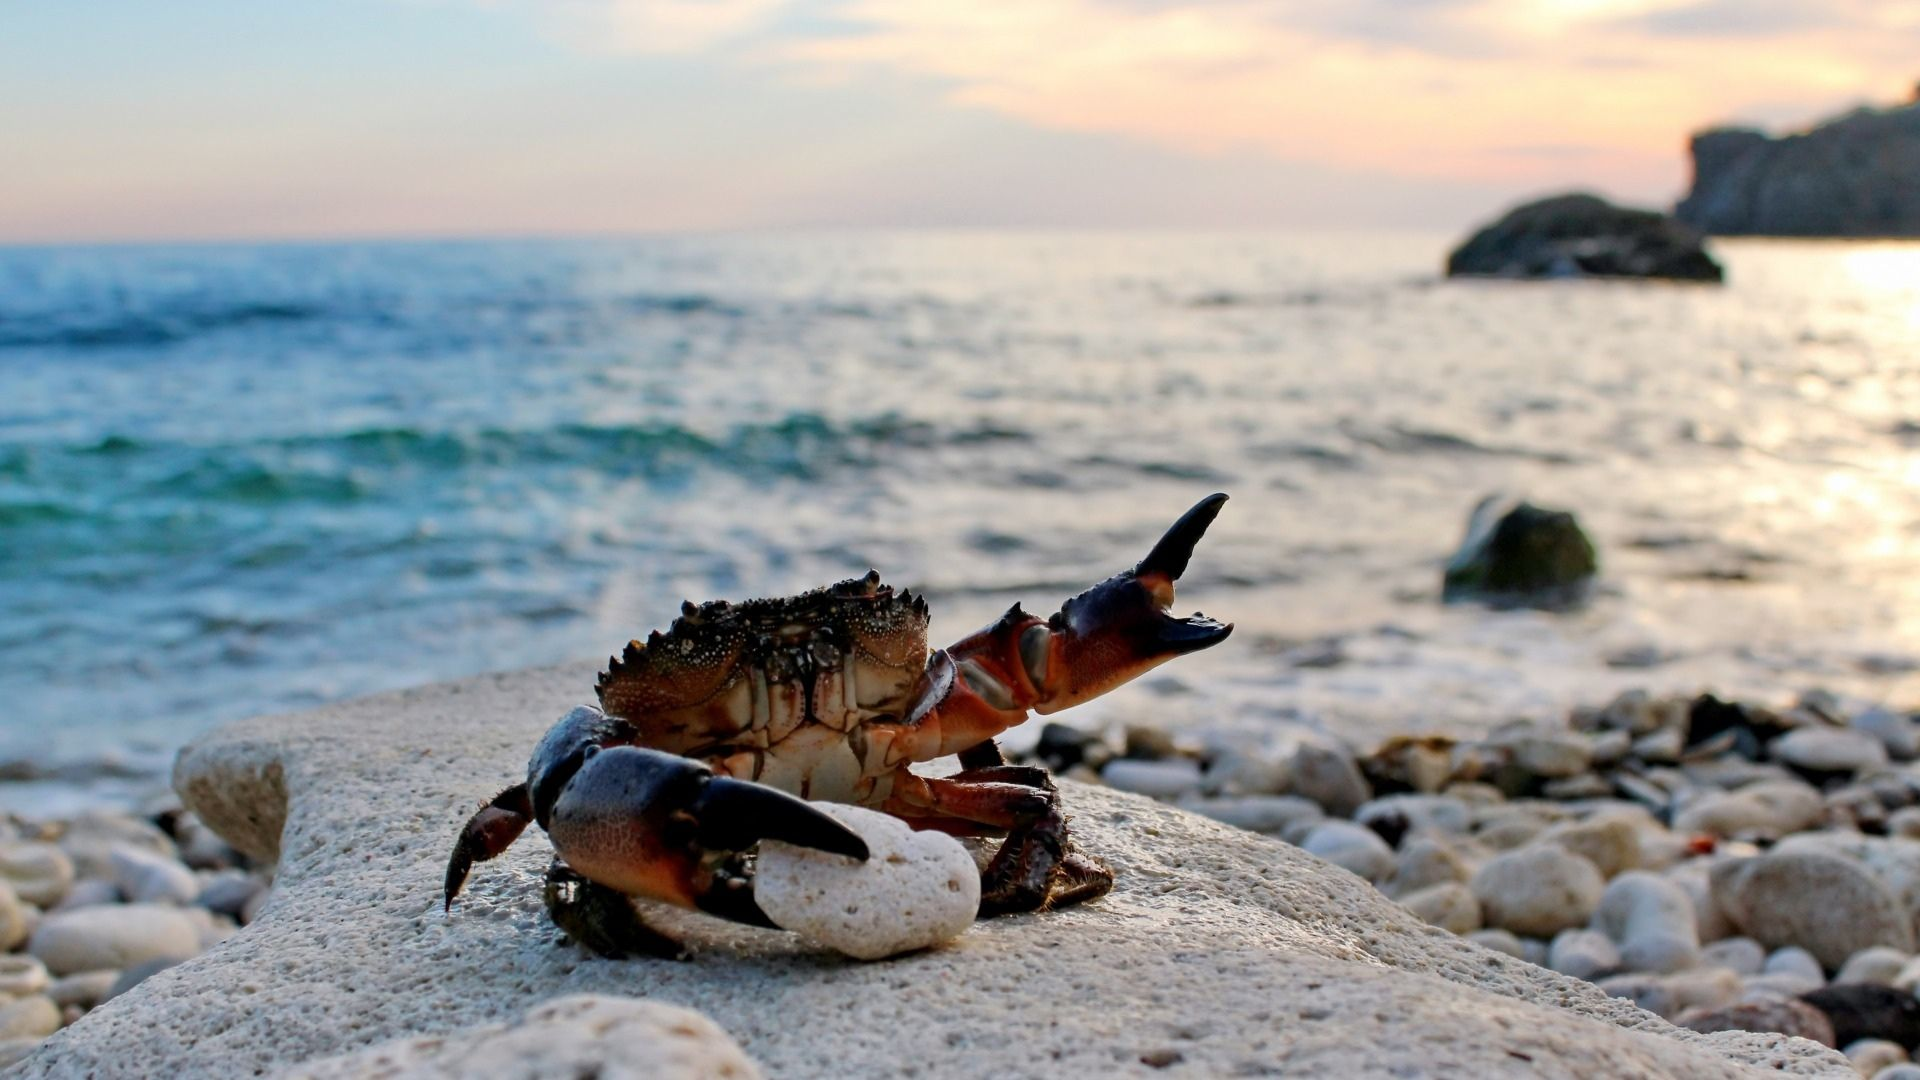 Crab best Wallpaper